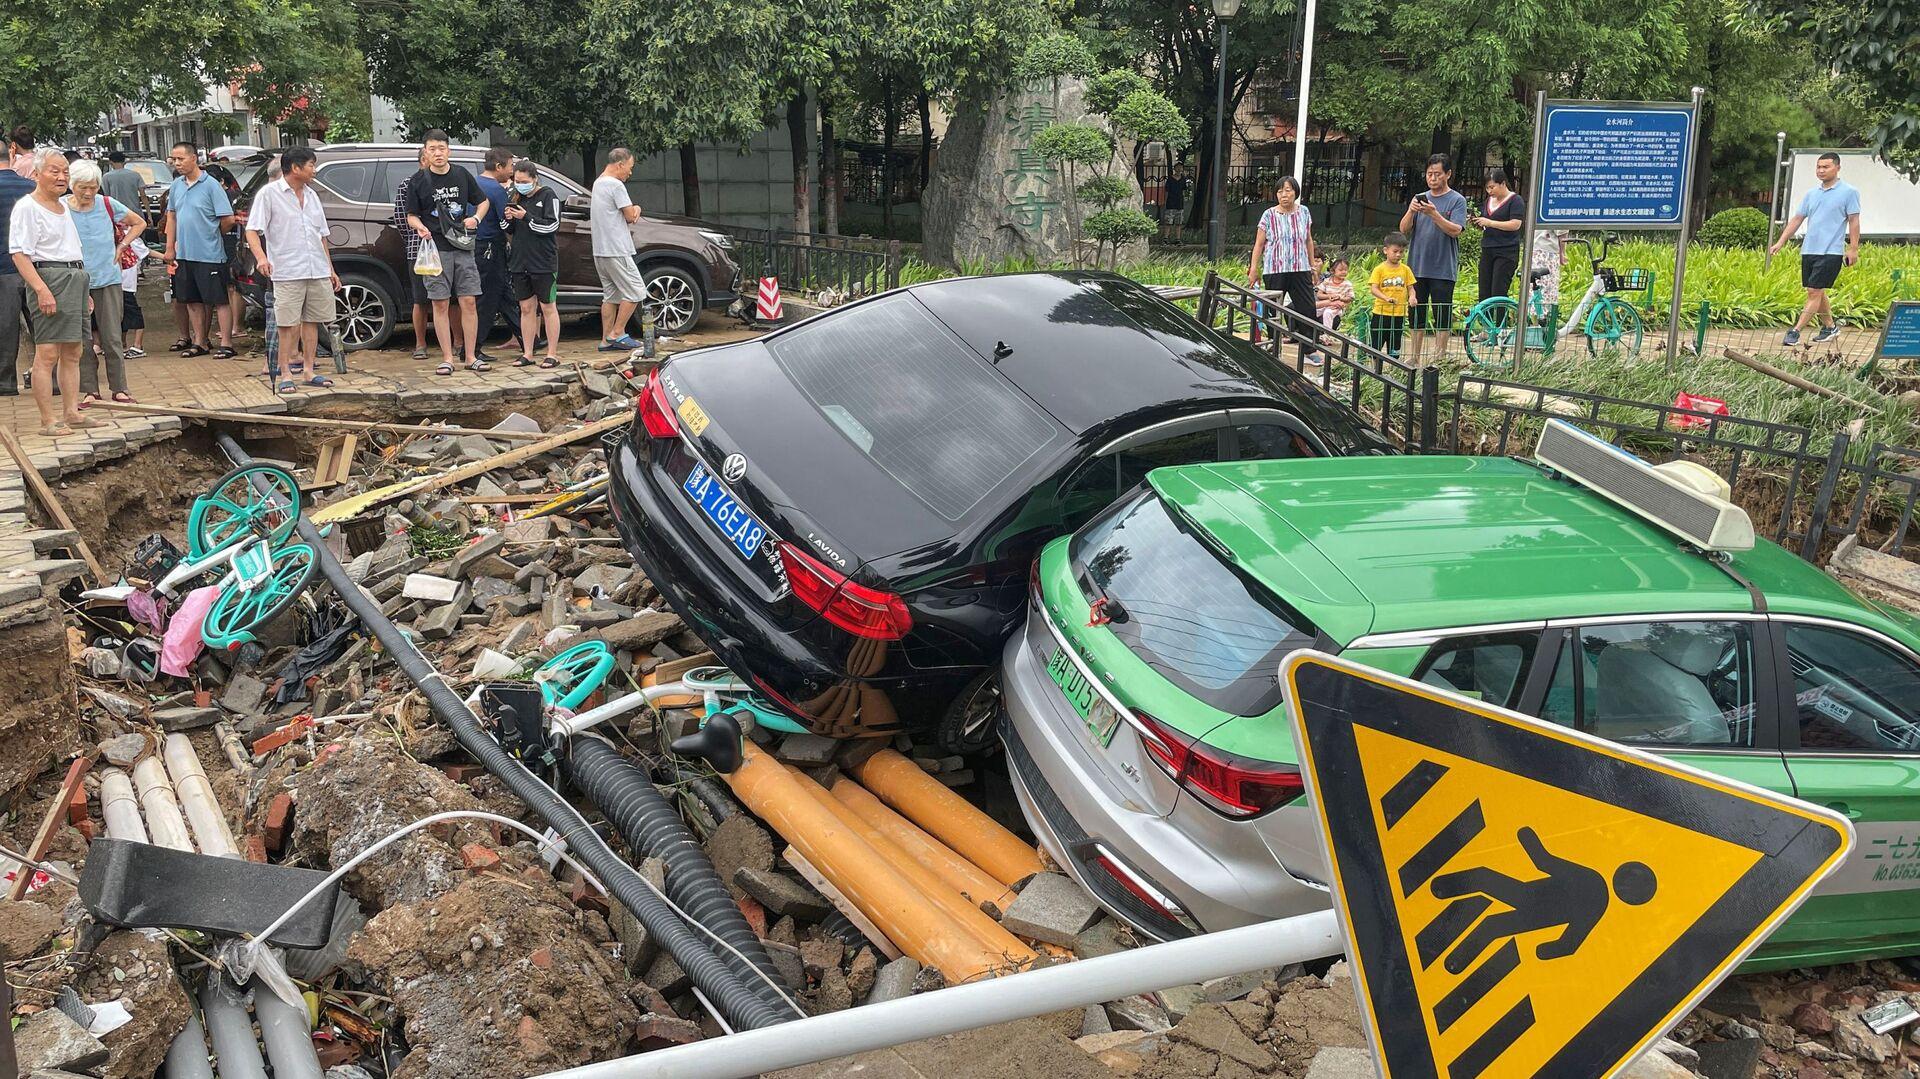 Damaged cars rest on debris after heavy rains hit the city of Zhengzhou causing floods in China's central Henan province on July 21, 2021.  - Sputnik International, 1920, 02.08.2021